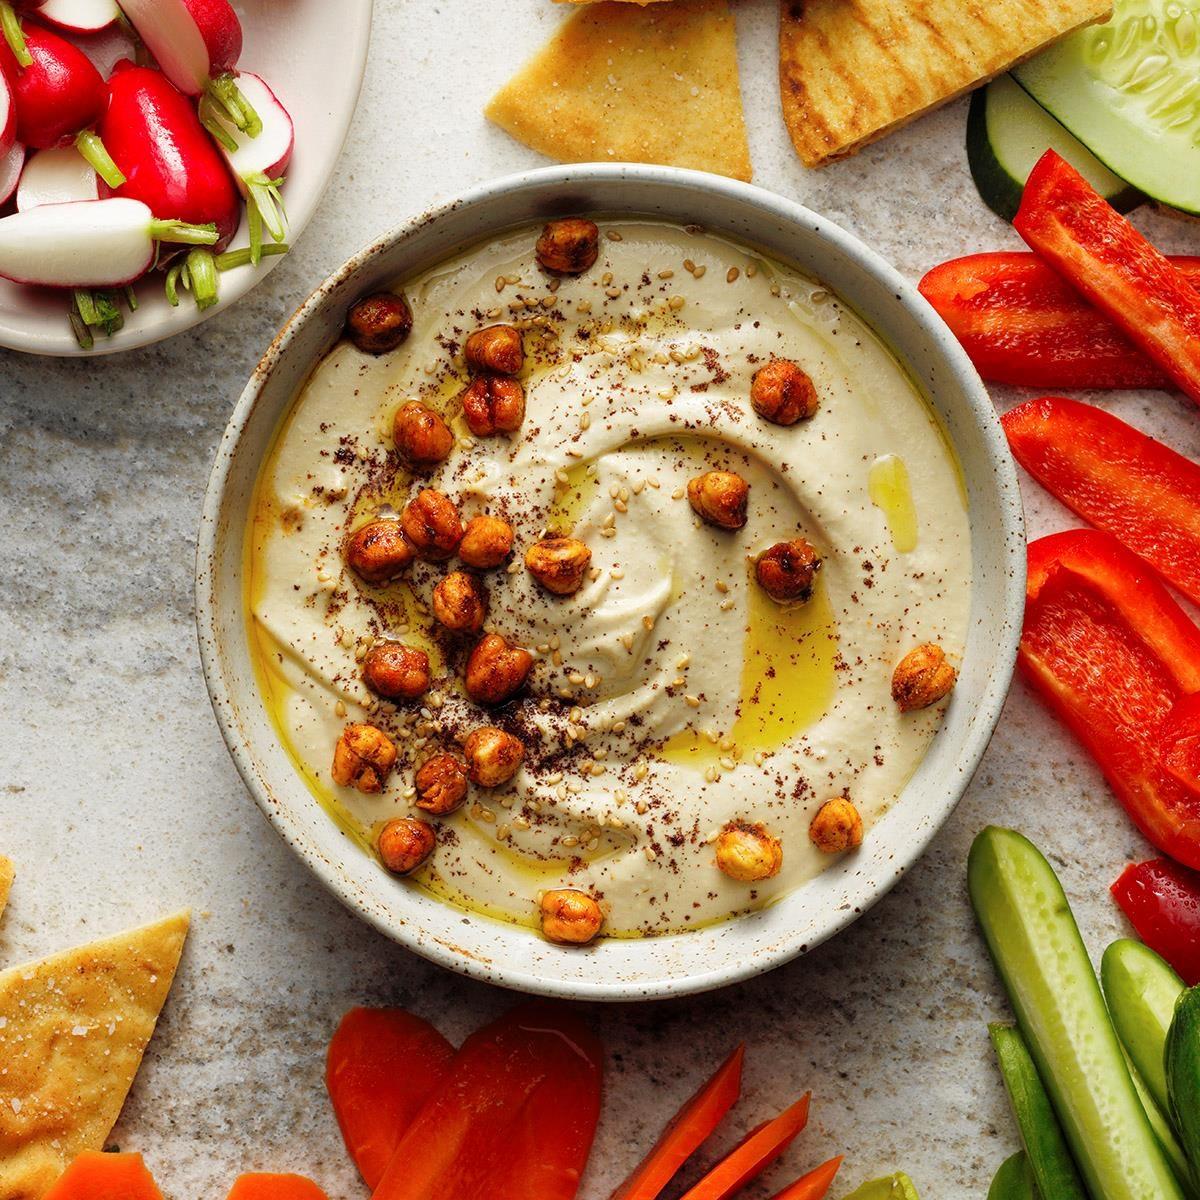 The Best Hummus Exps Tohdj21 253825 E08 11 2b 8